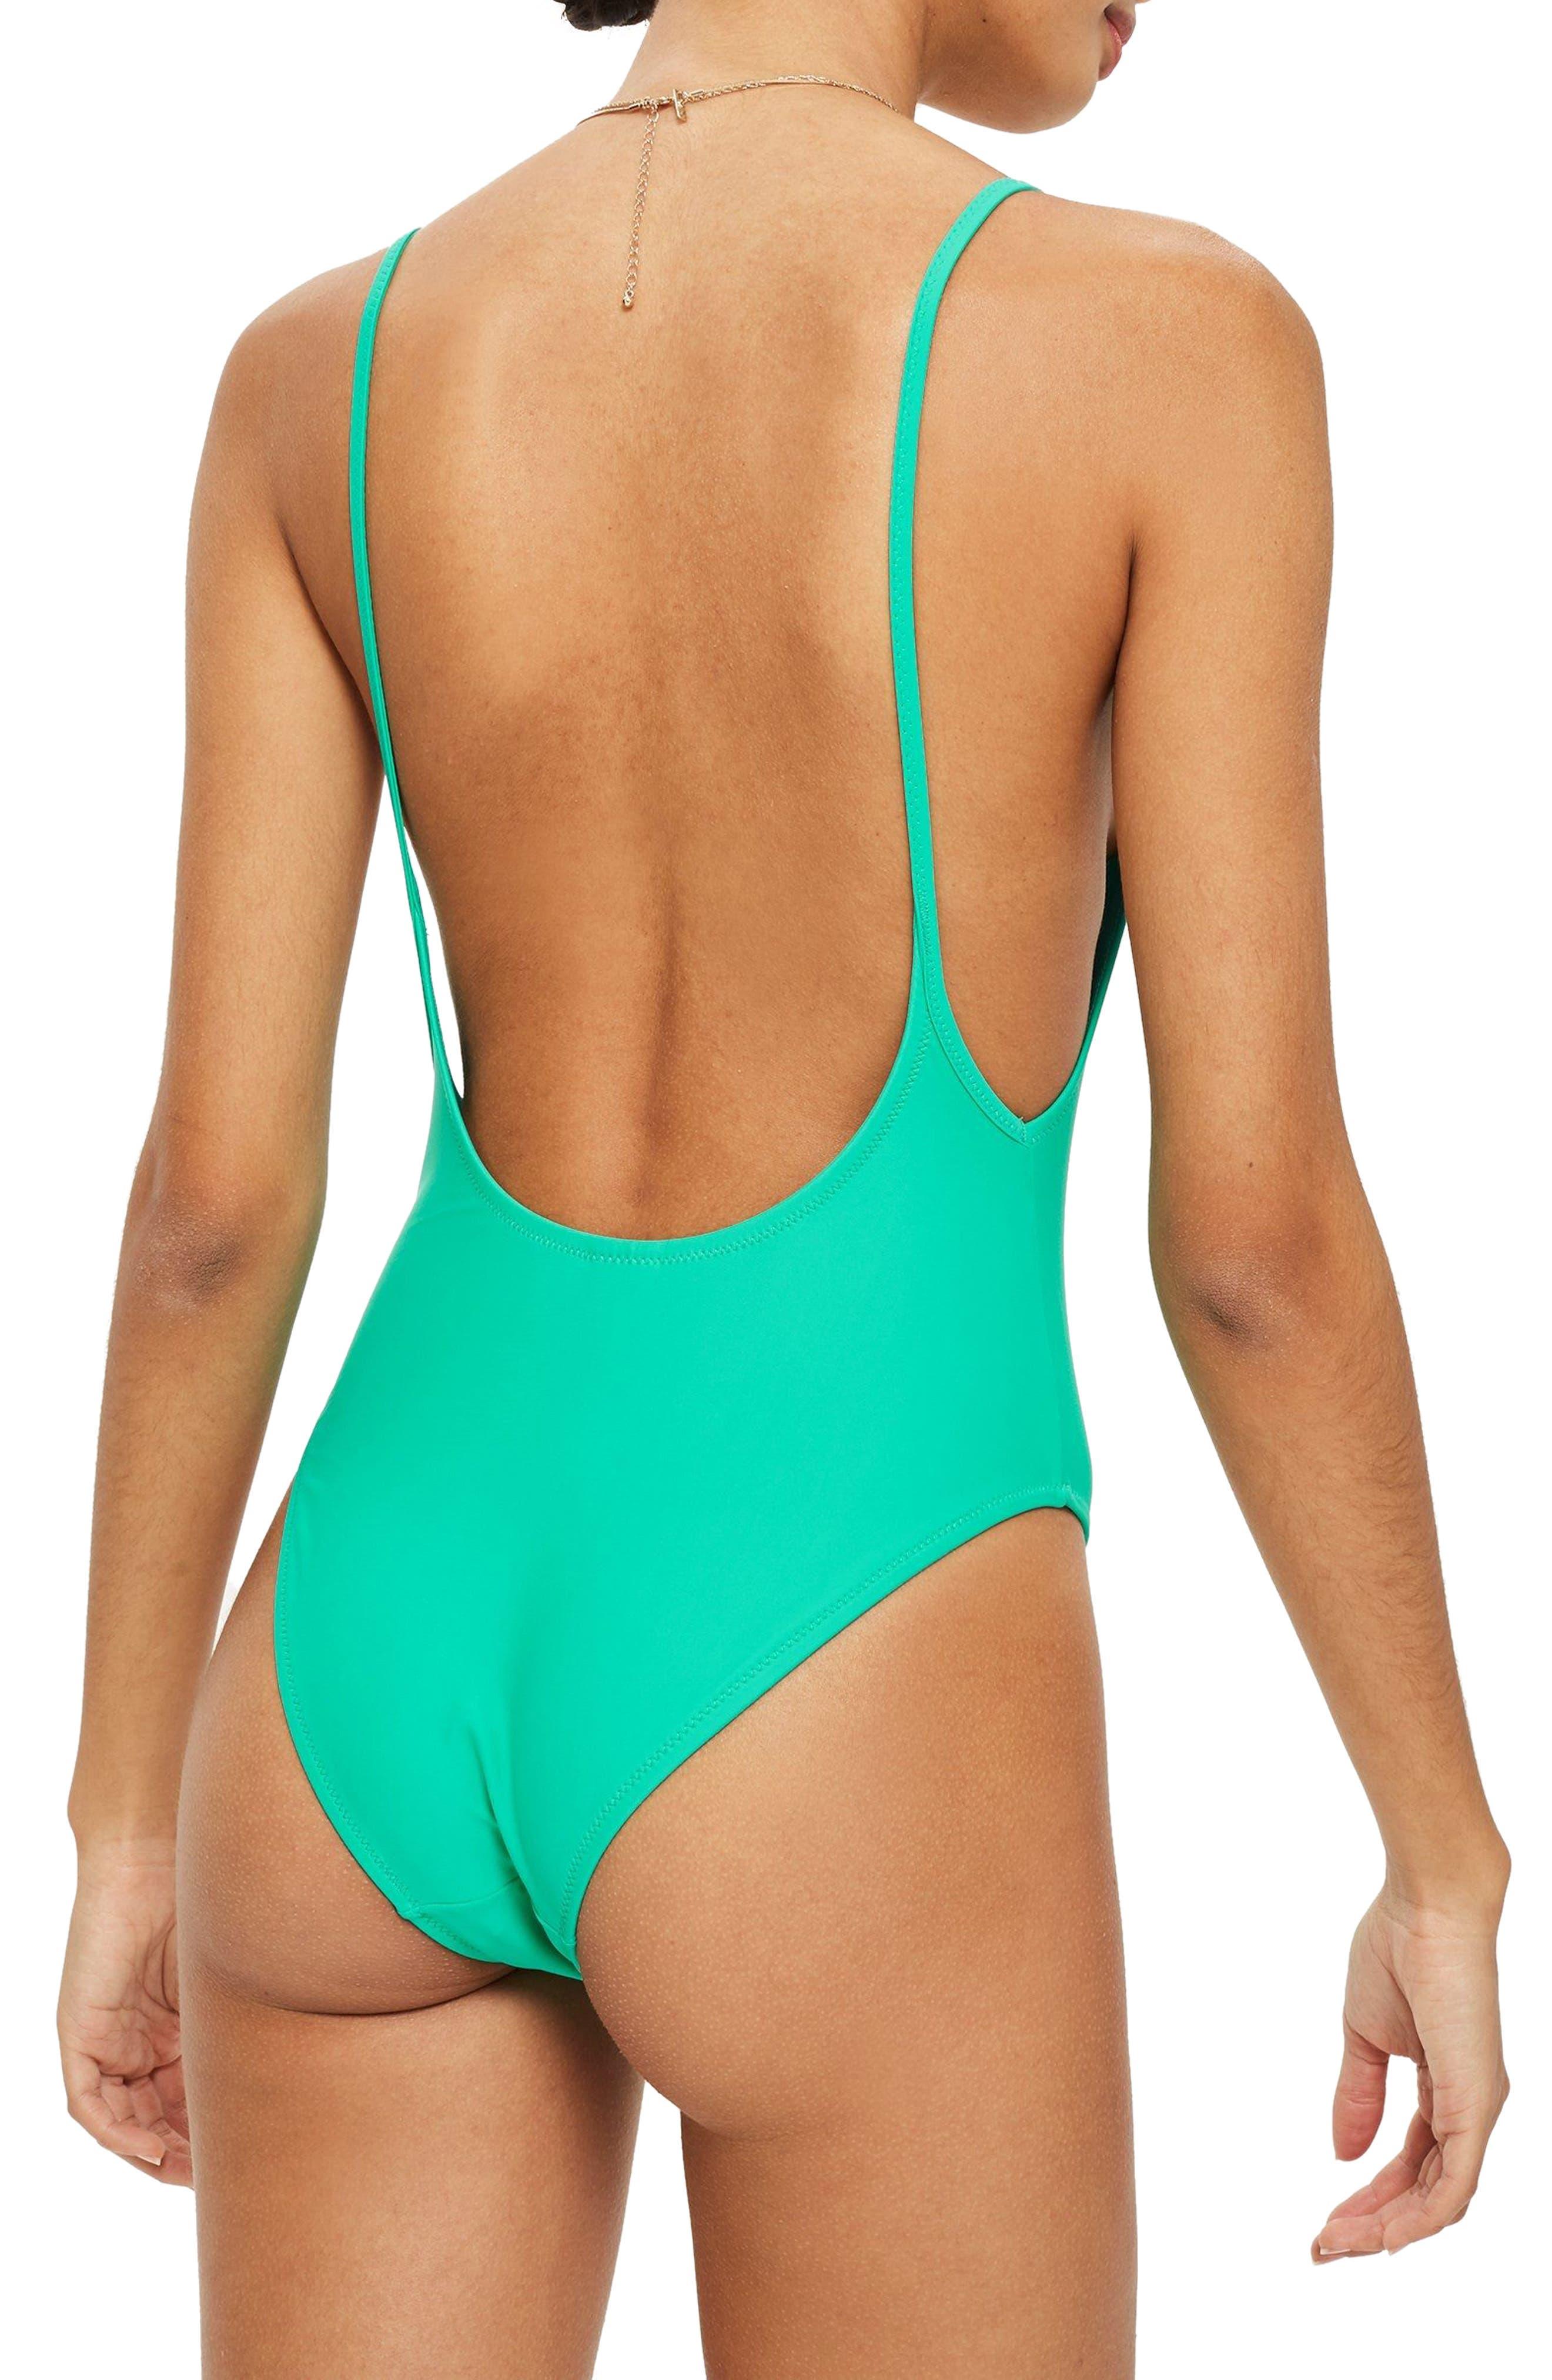 Pamela One-Piece Swimsuit,                             Alternate thumbnail 2, color,                             TEAL